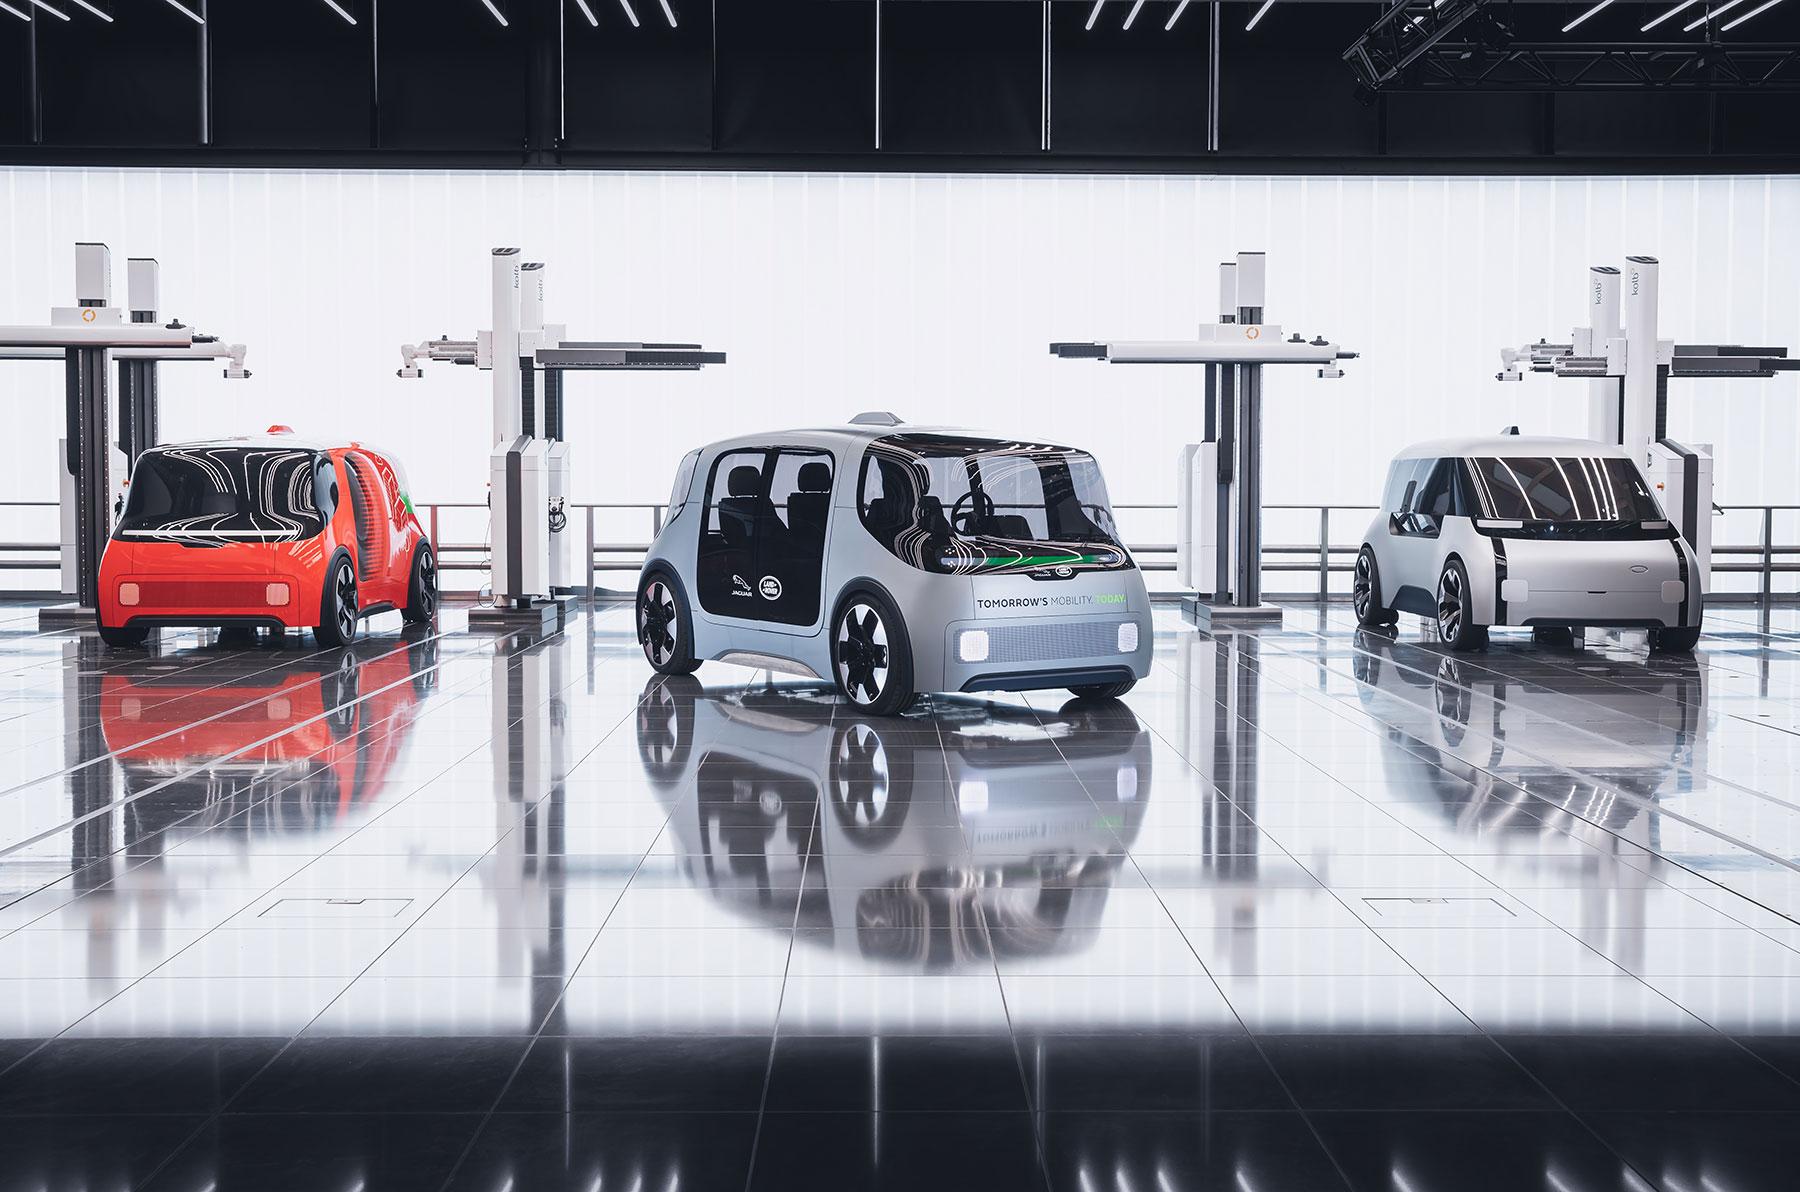 Jaguar Land Rover entdeckt die Zukunft der urbanen Mobilität